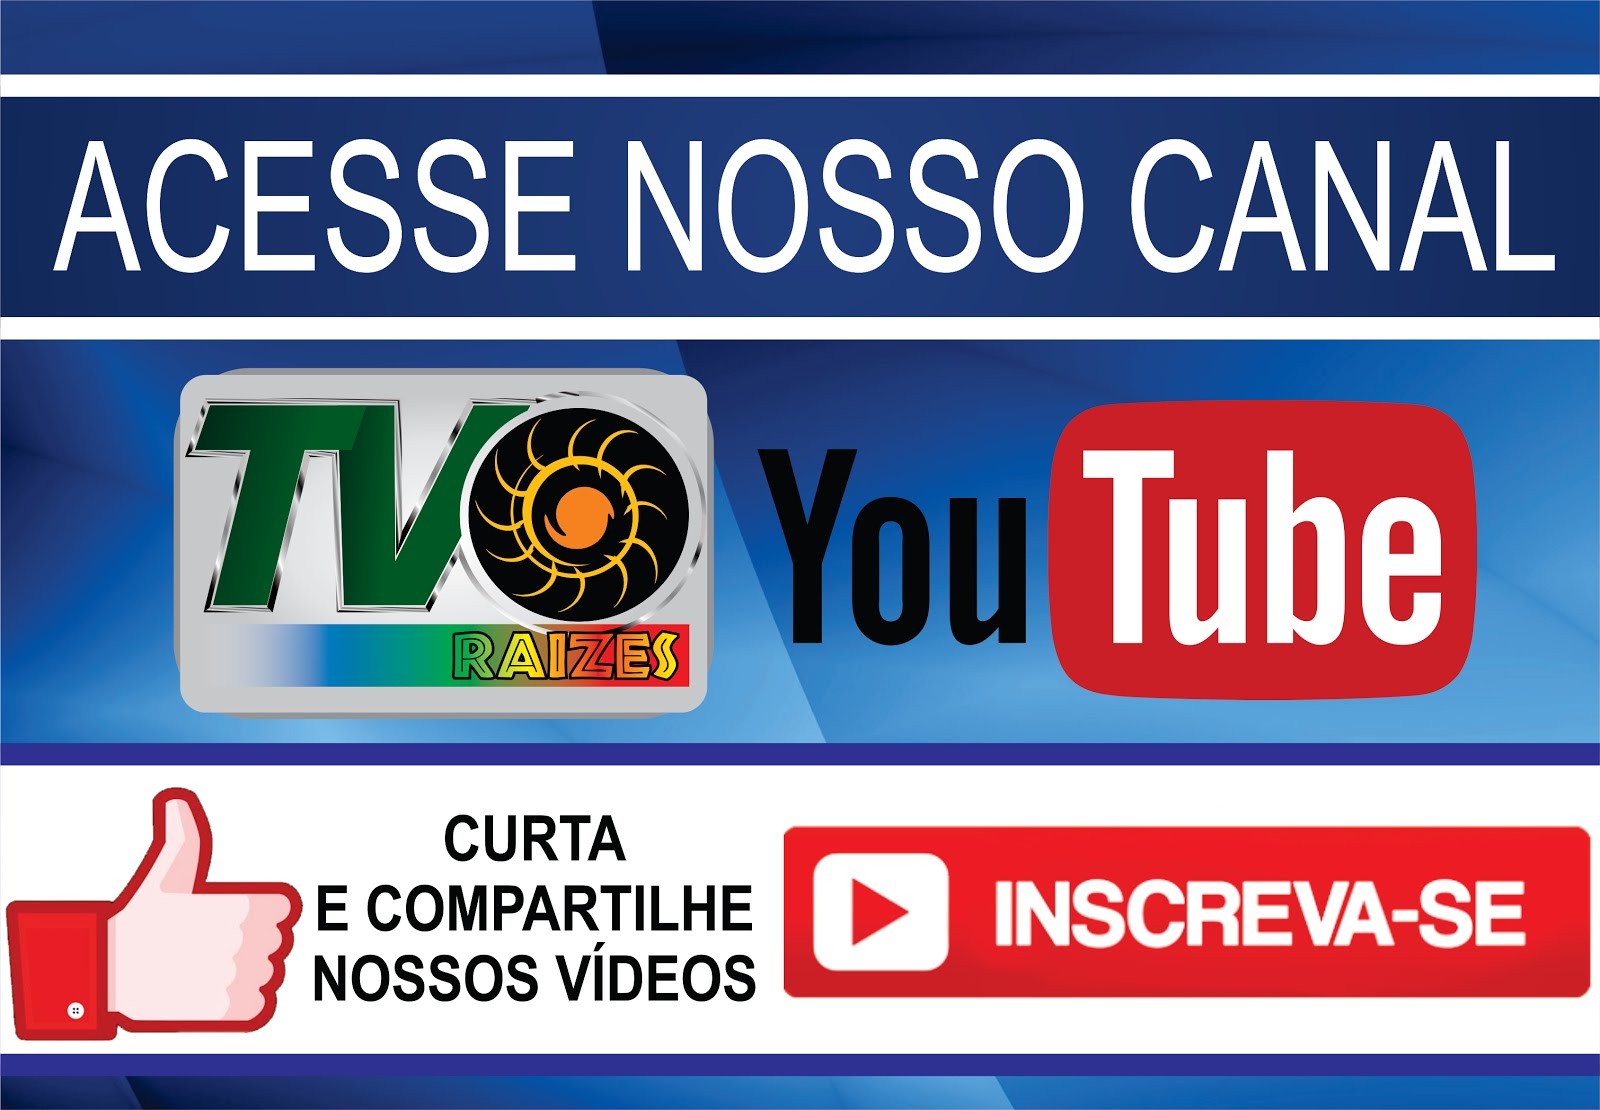 CANAL DA TV RAÍZES NO YOUTUBE